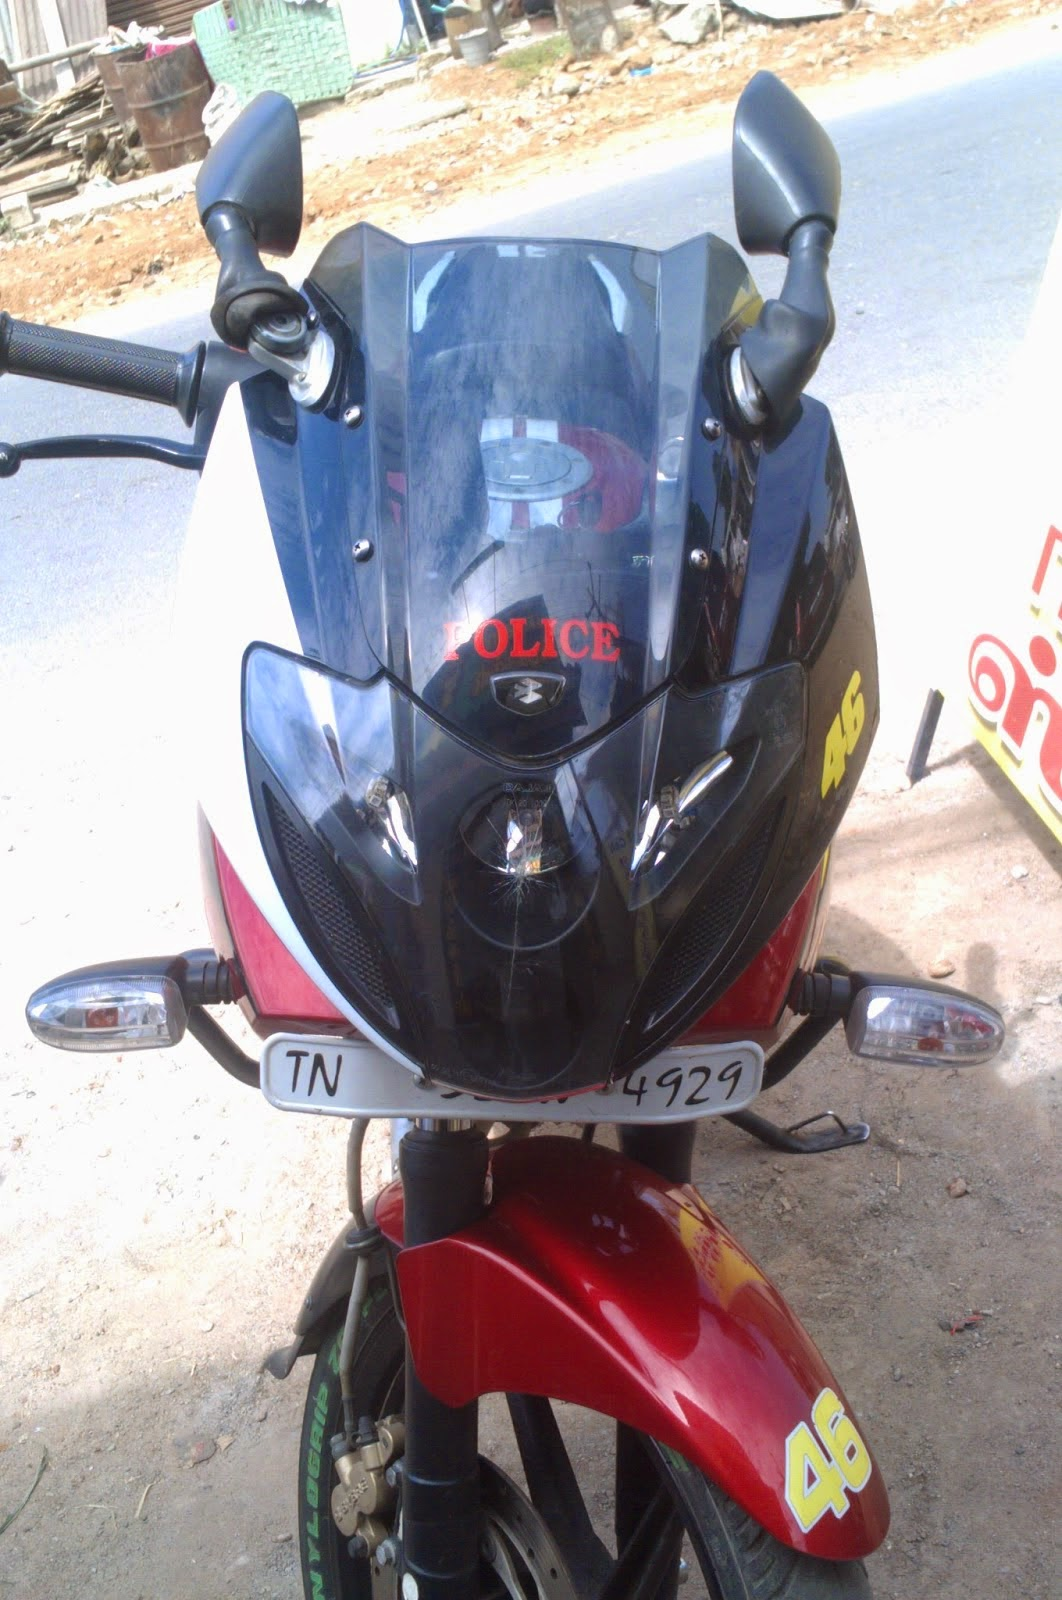 Bike stickers design india - Bike Visor Stickers Design Raja Stickers Salem Mettur Dam 1 Tamil Nadu India